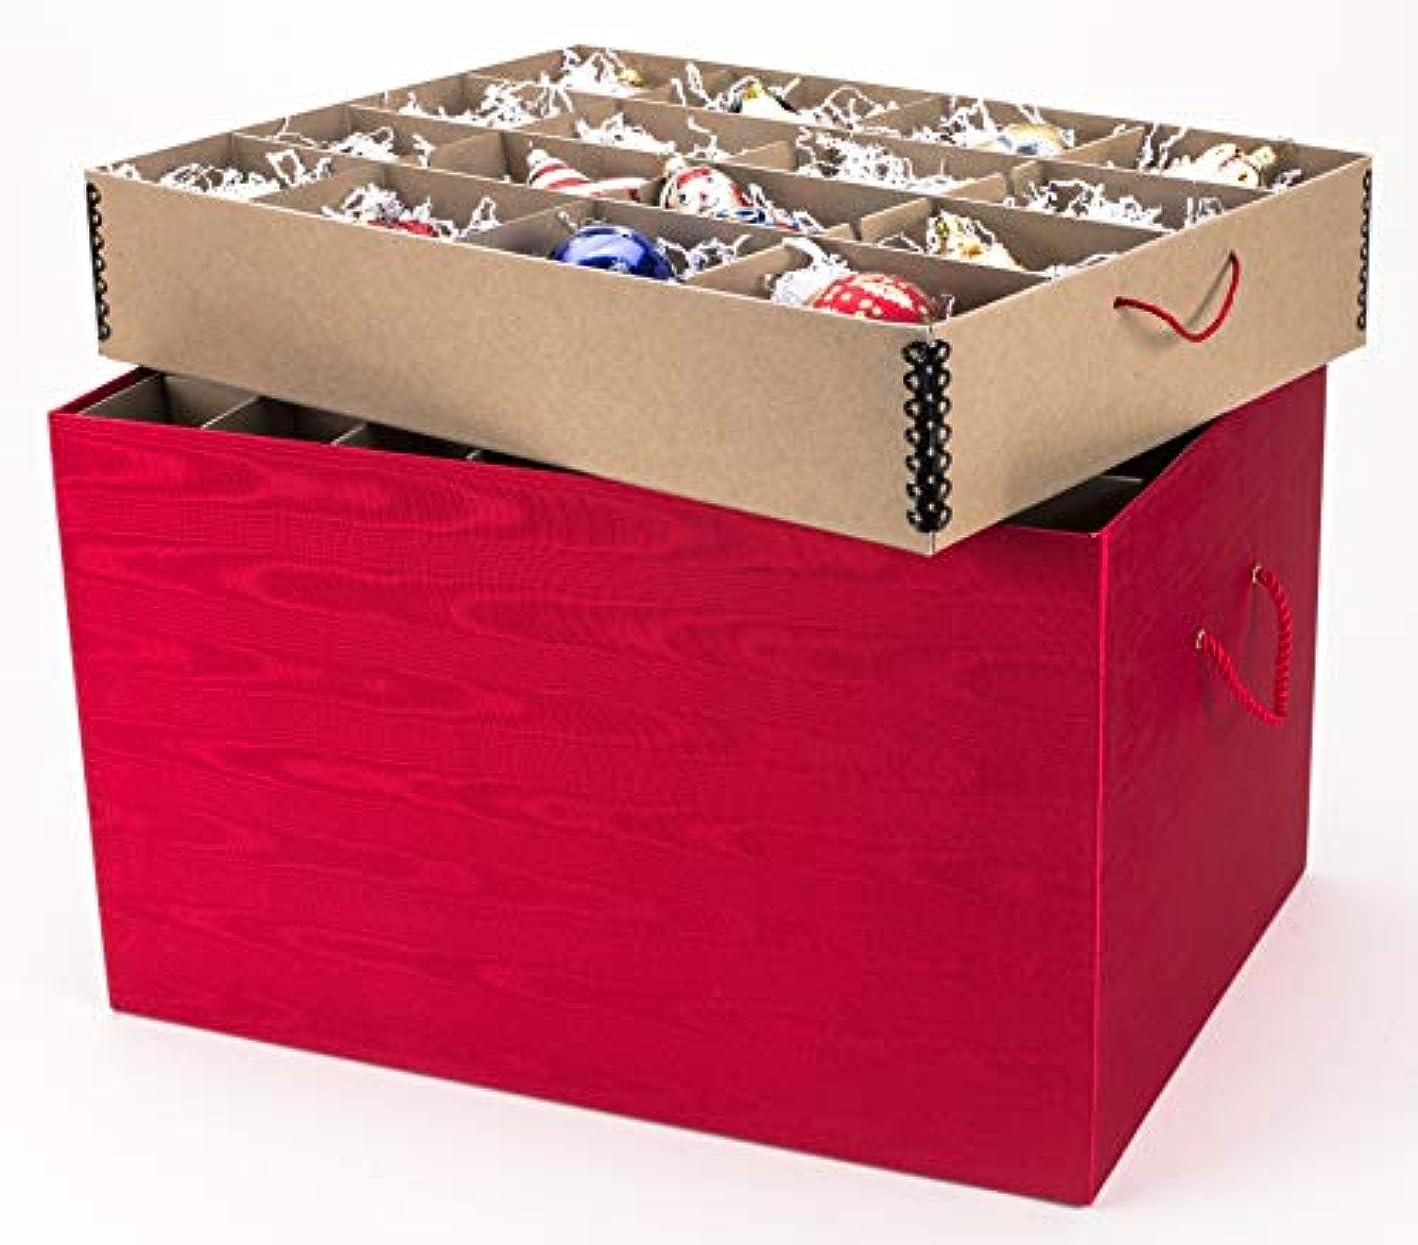 Ultimate Ornament Chest - Red Moire Stripe, Acid-Free Ornament Storage Box